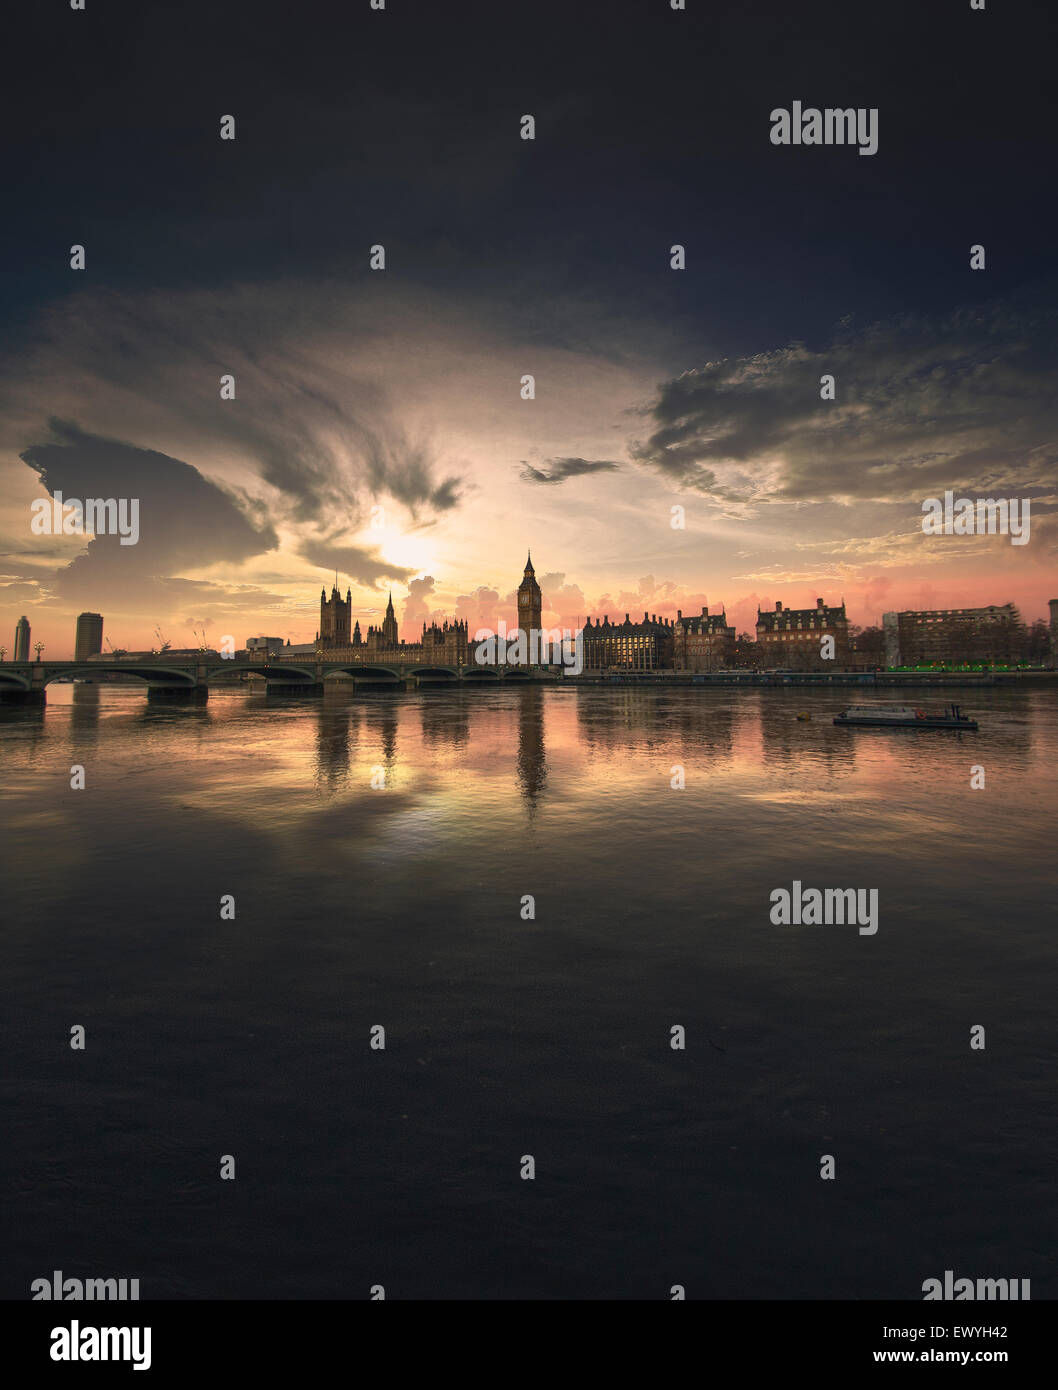 Westminster Sunset, London, UK - Stock Image